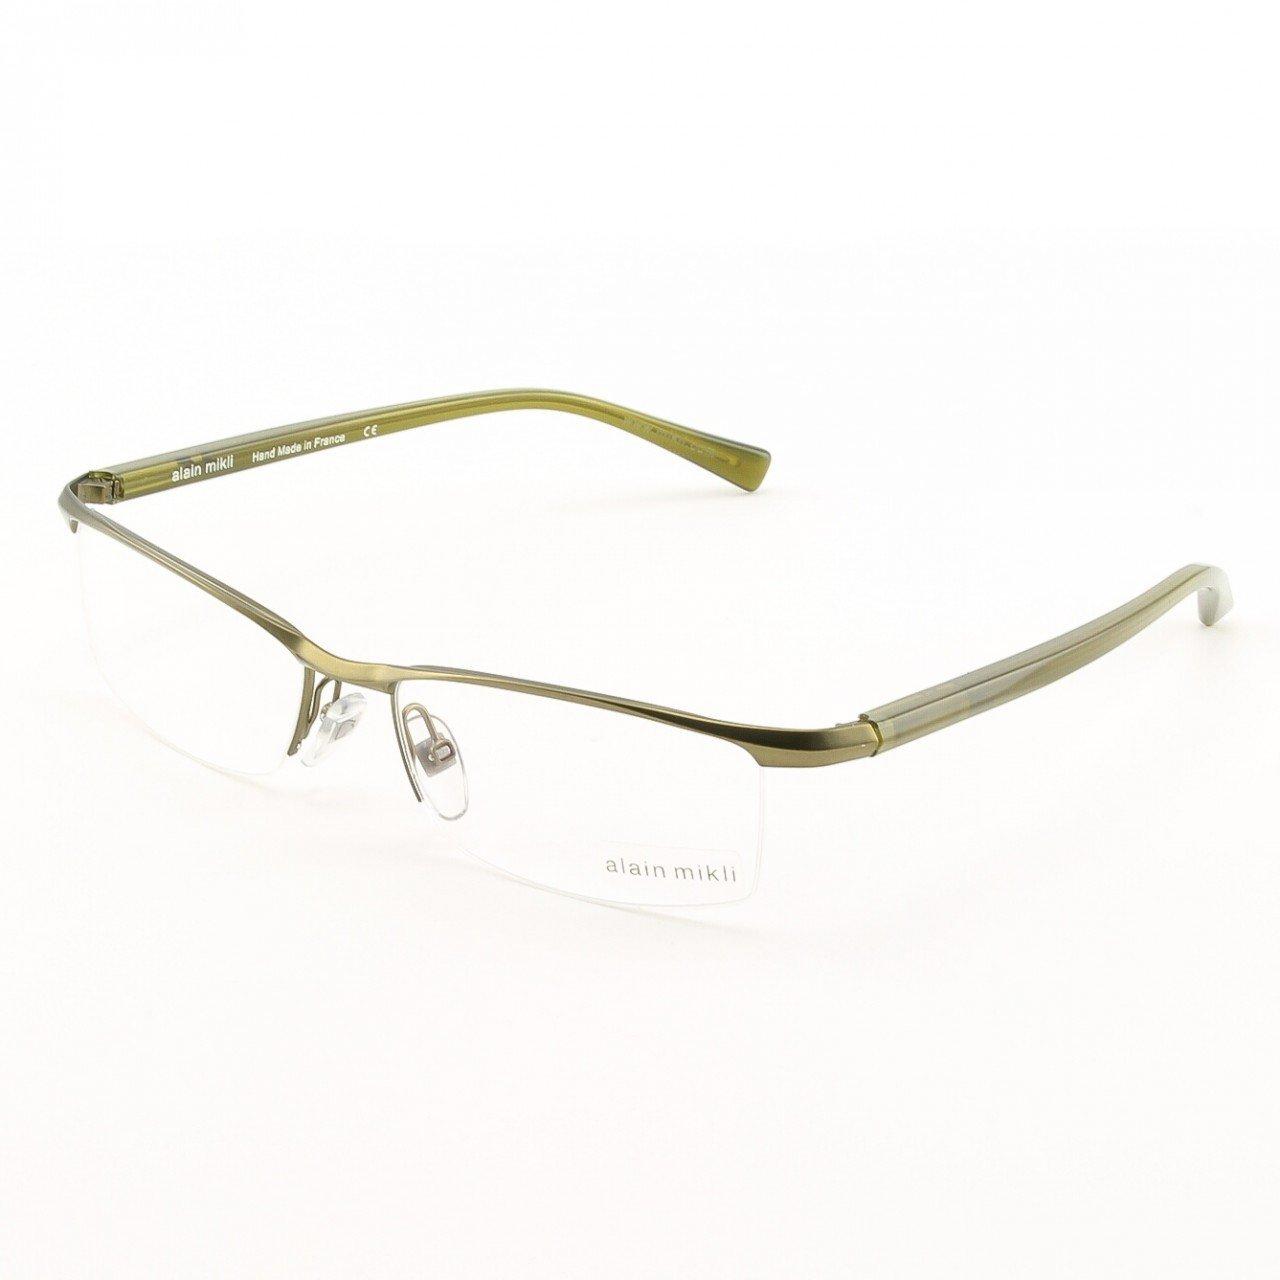 Alain Mikli Eyeglasses AL0888 Col. 6 Matte Green with Green Herringbone Temples